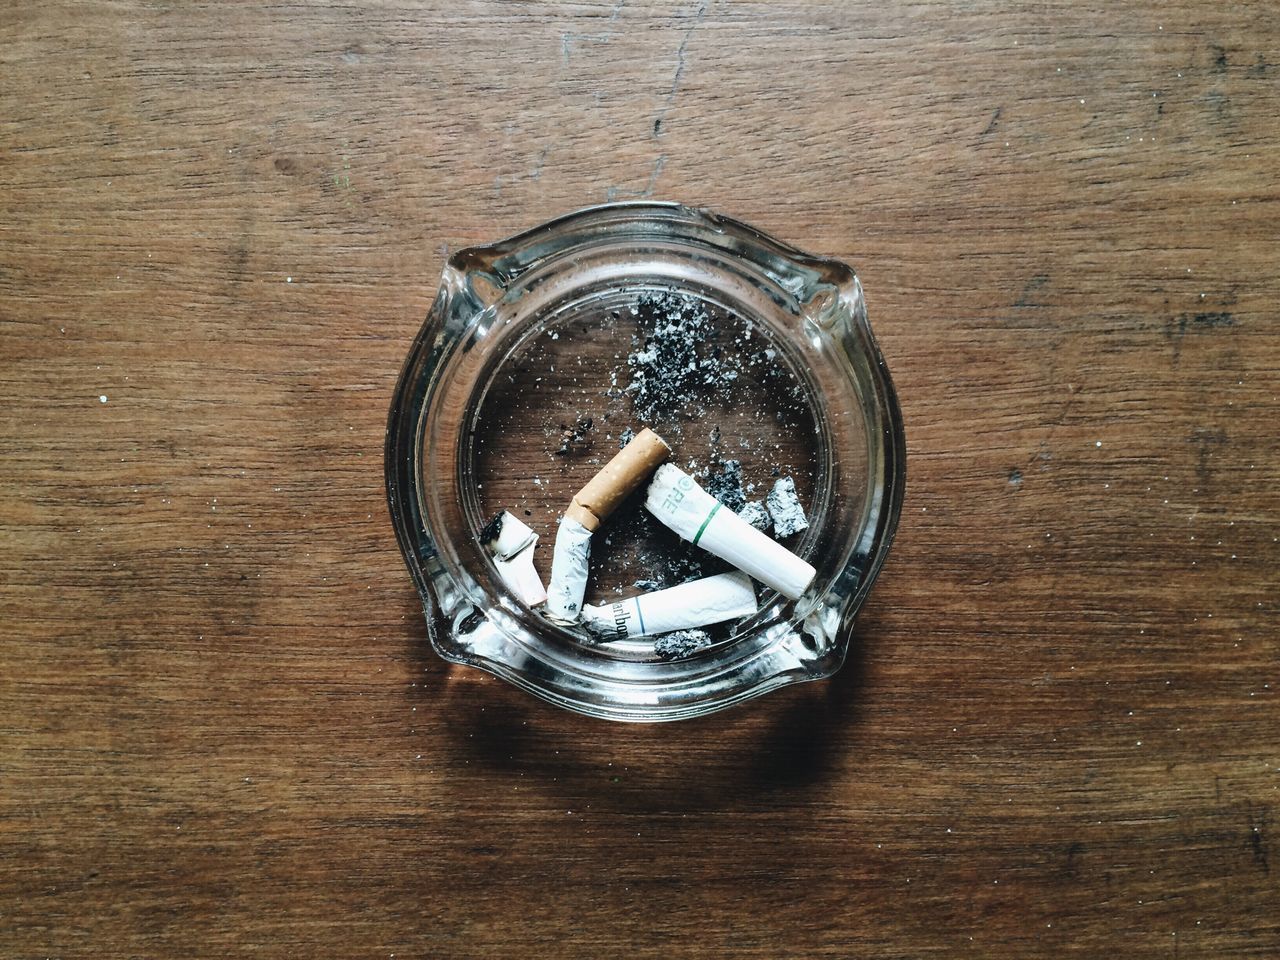 ash Minimalism StillLifePhotography Stillphotography Wood - Material Cigarette  Smoke